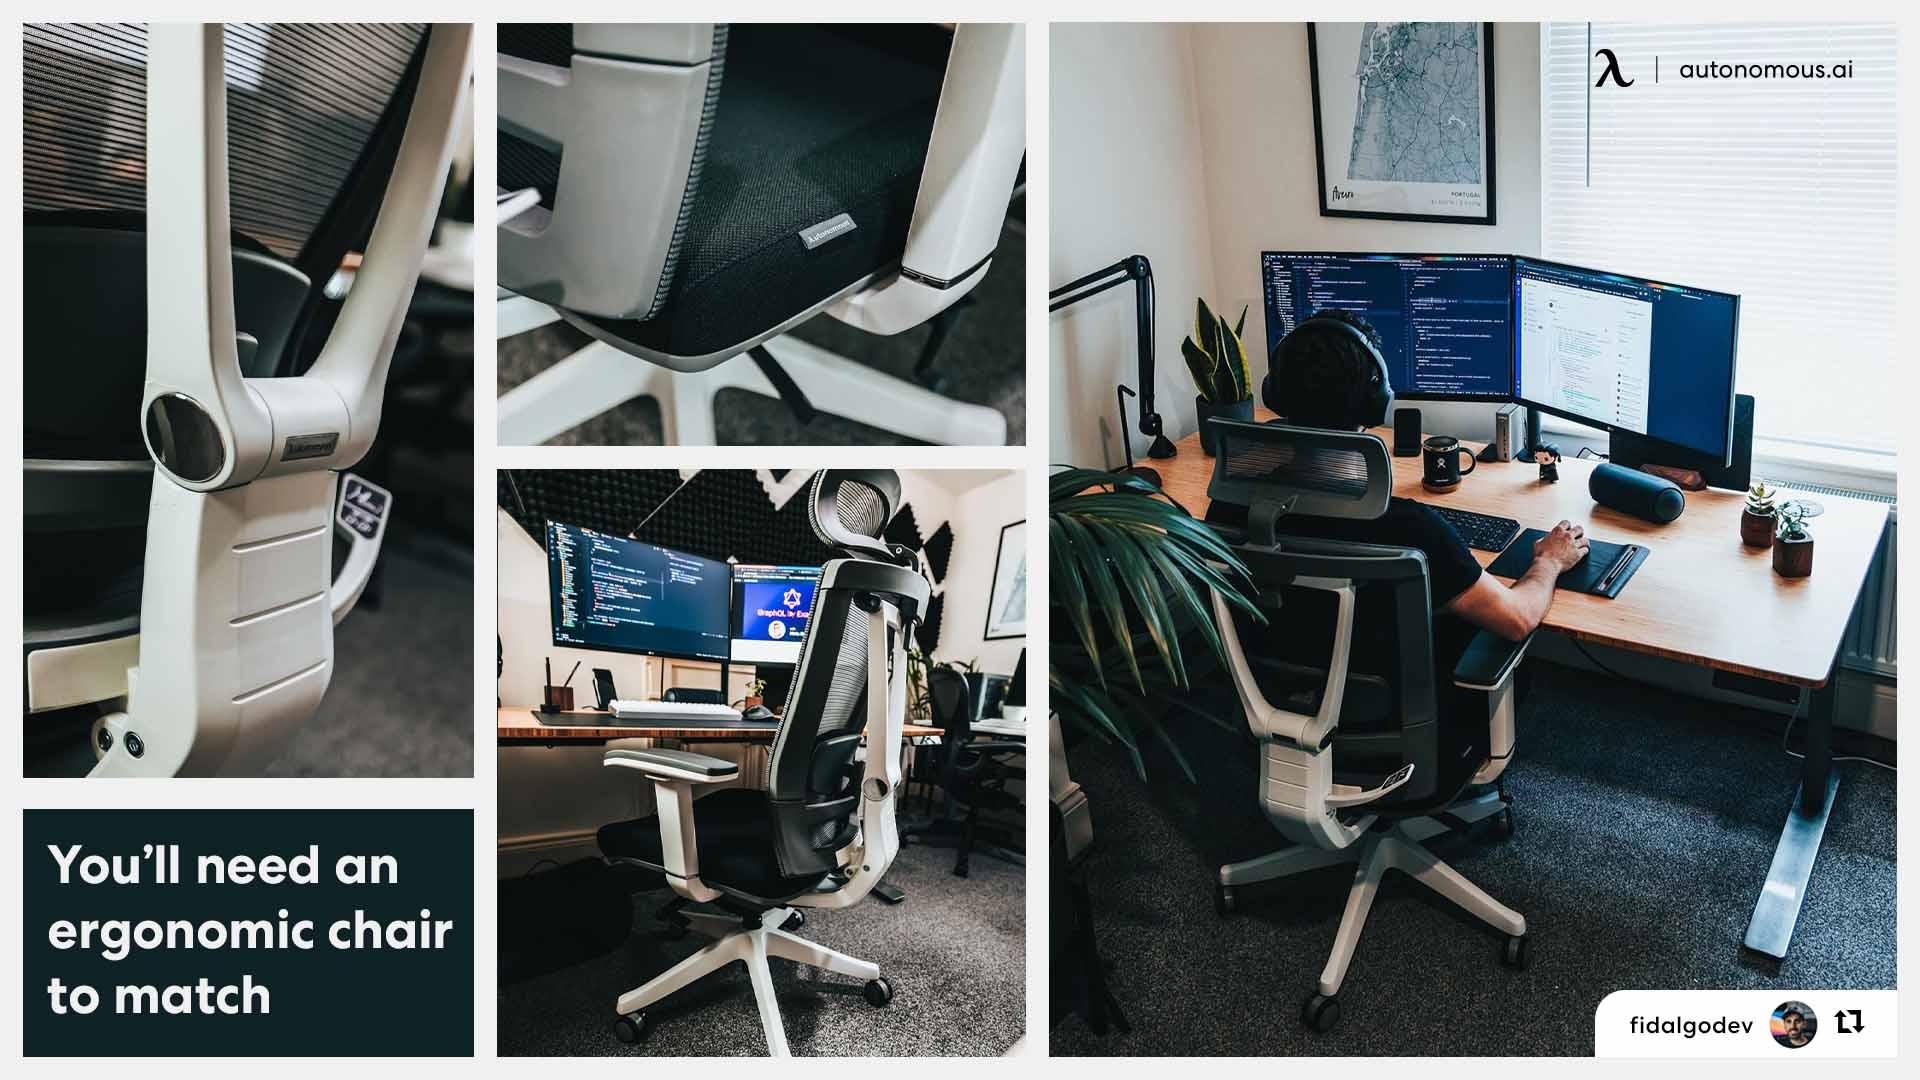 an ergonomic chair to match trading setup